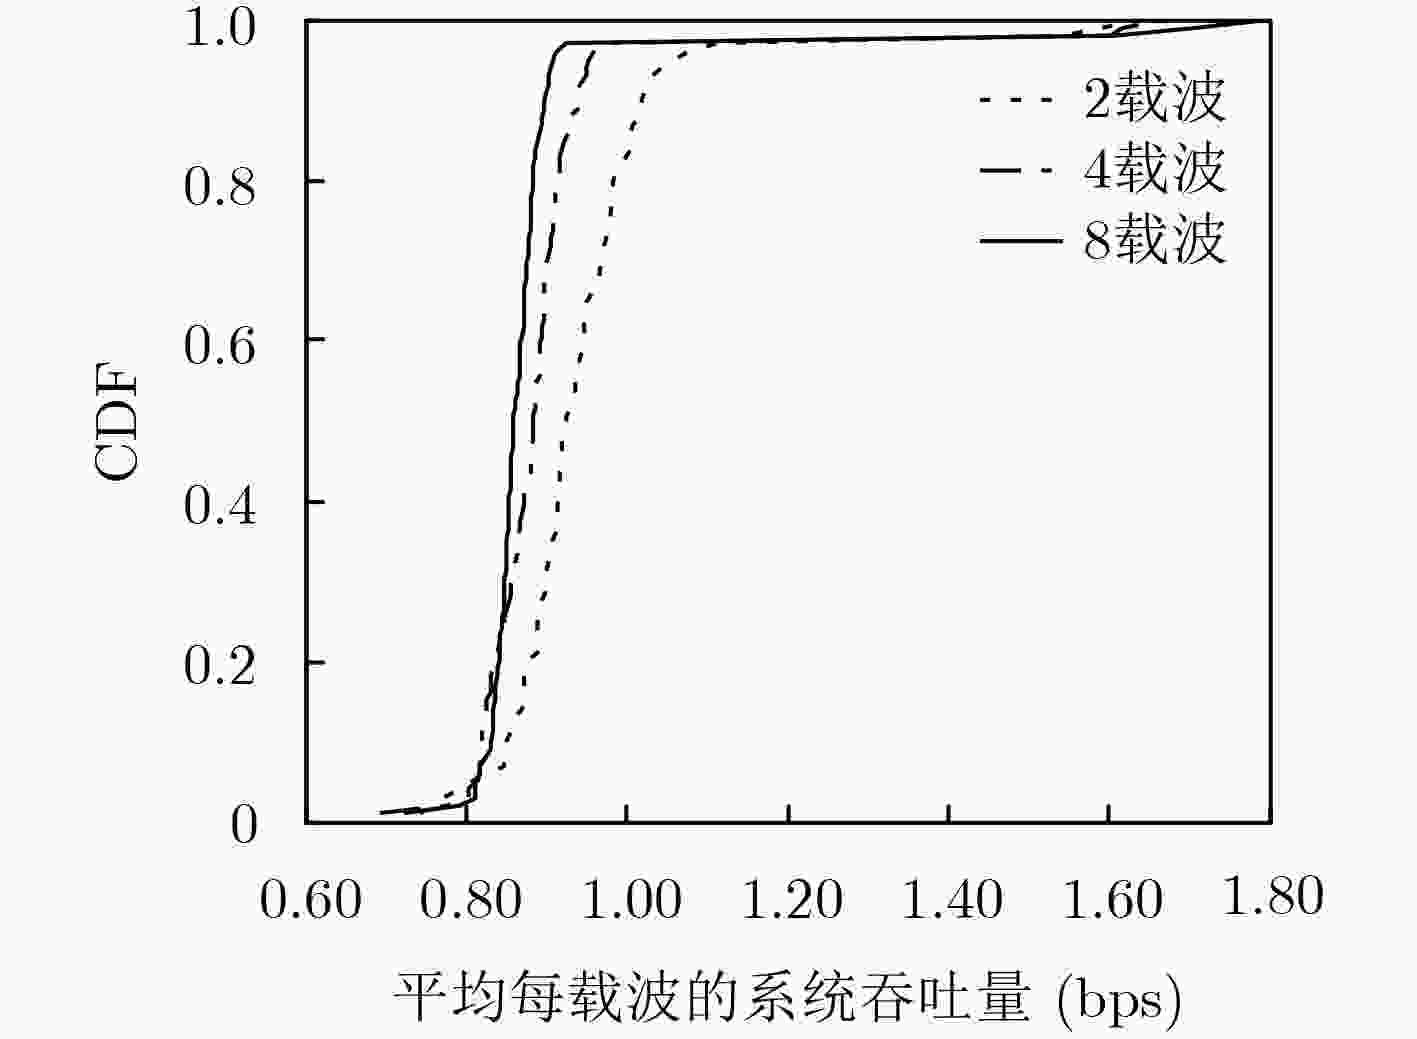 增量pid算法_pid算法原理_增量pid算法